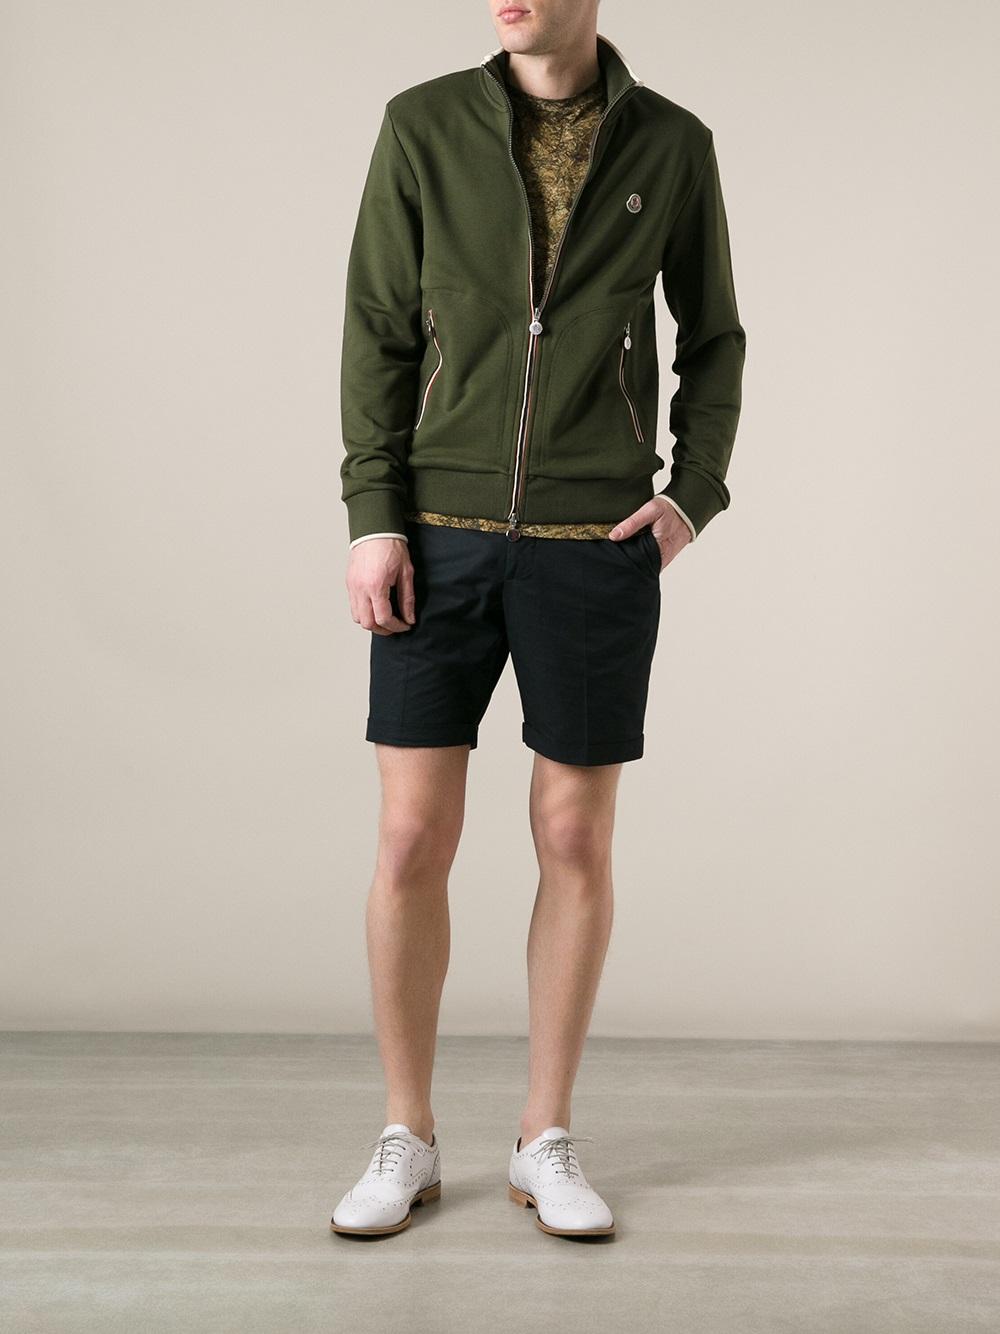 moncler green sweatshirt